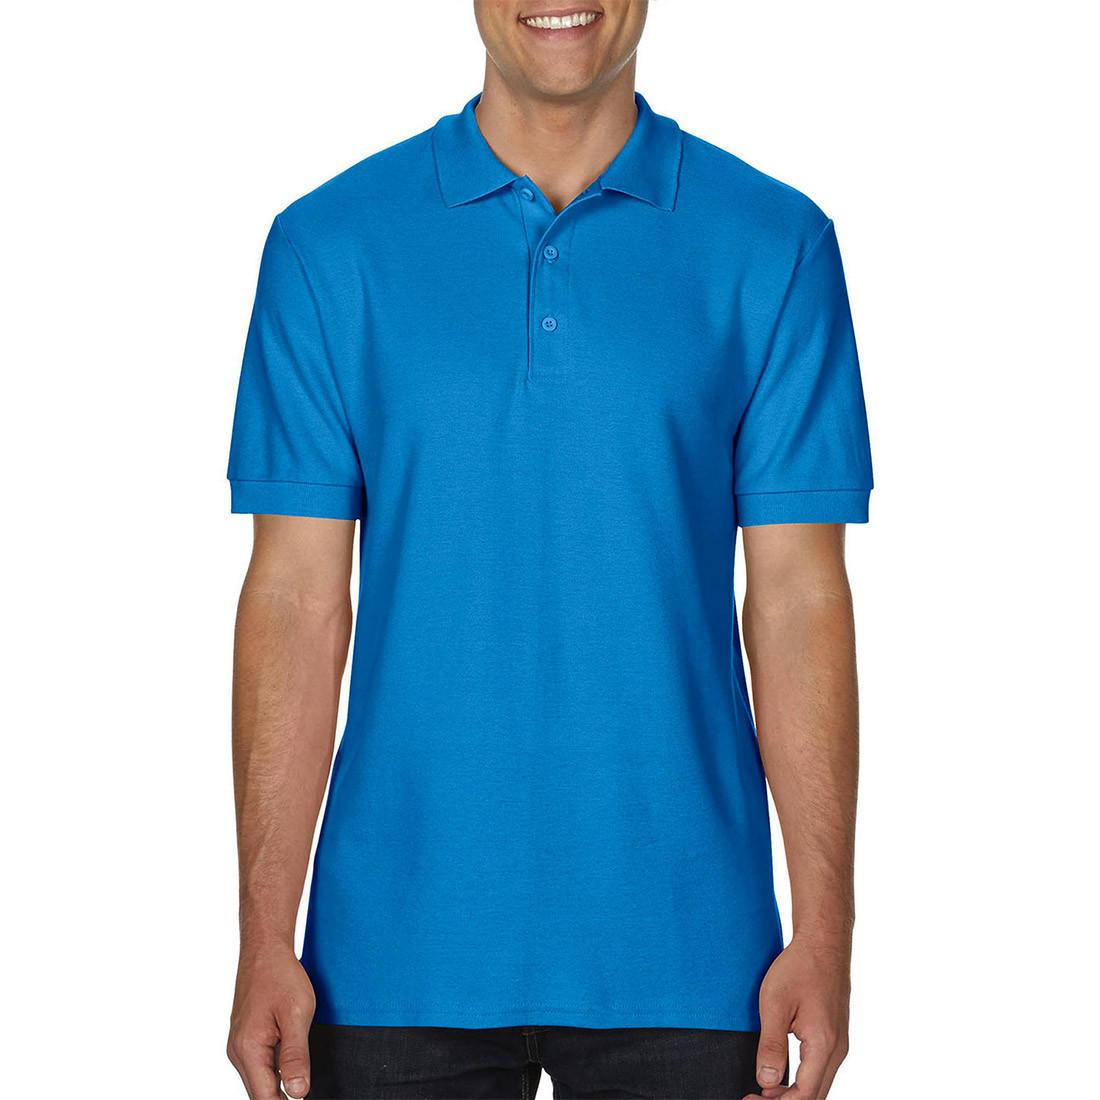 Tricou Polo Premium Cotton - Imbracaminte de protectie